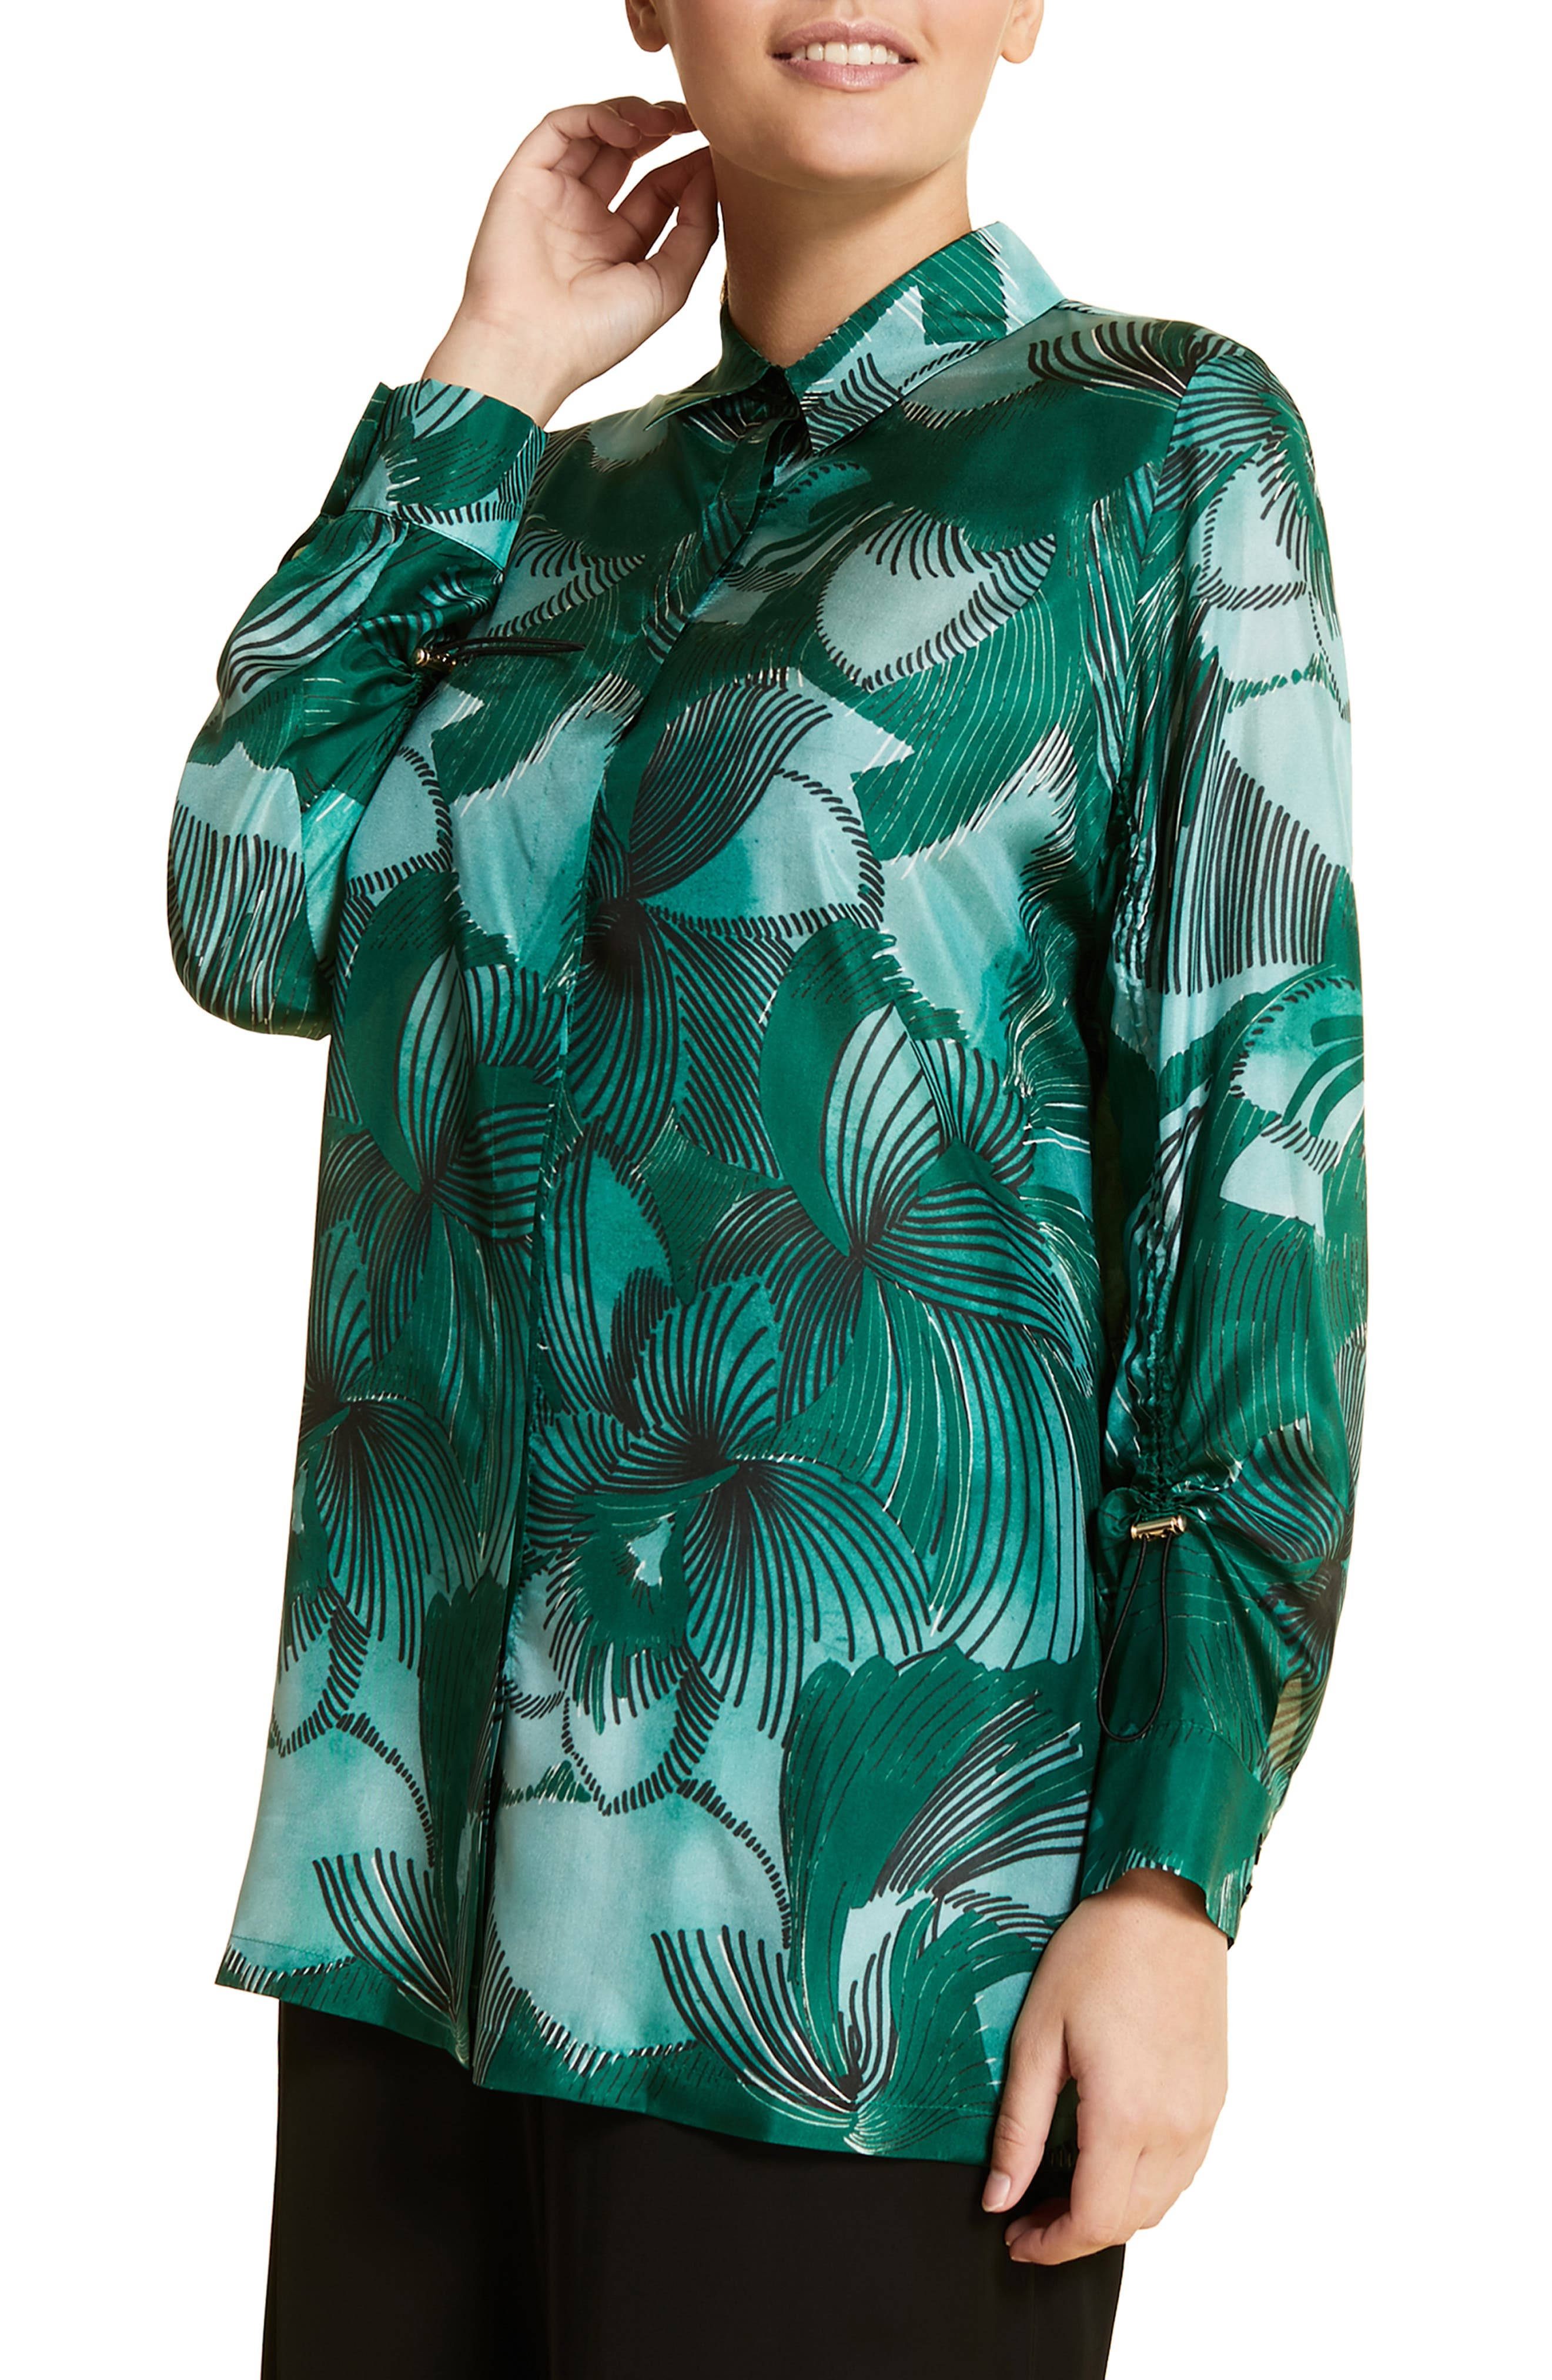 plus size women's marina rinaldi fiorenza silk shirt